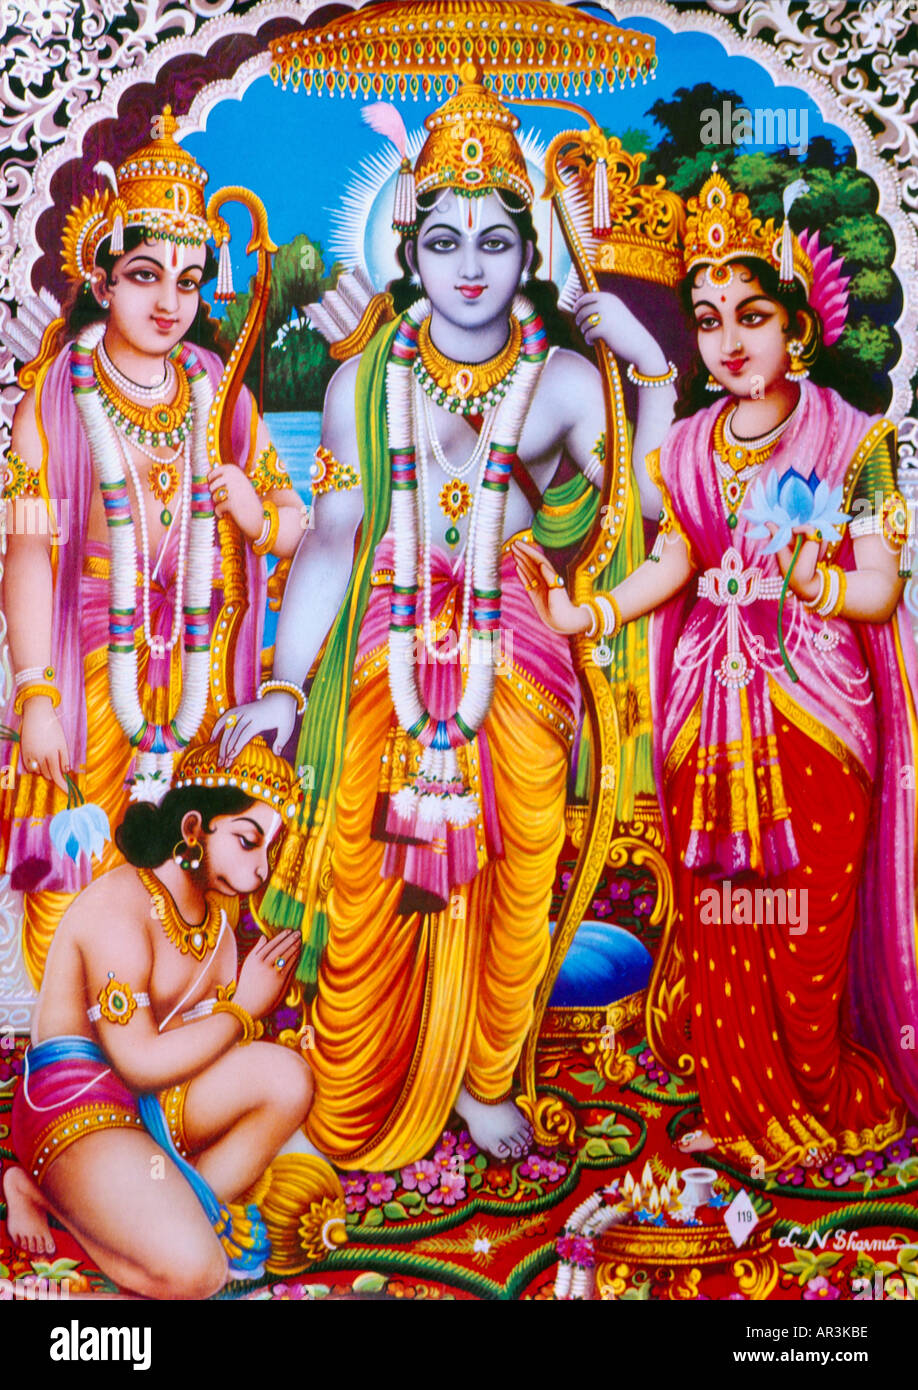 rama and sita Rama and sita summary no one surpassed the prince rama in strength, handsomeness, wisdom, or pietyhe won the princess sita by bending a tremendo.